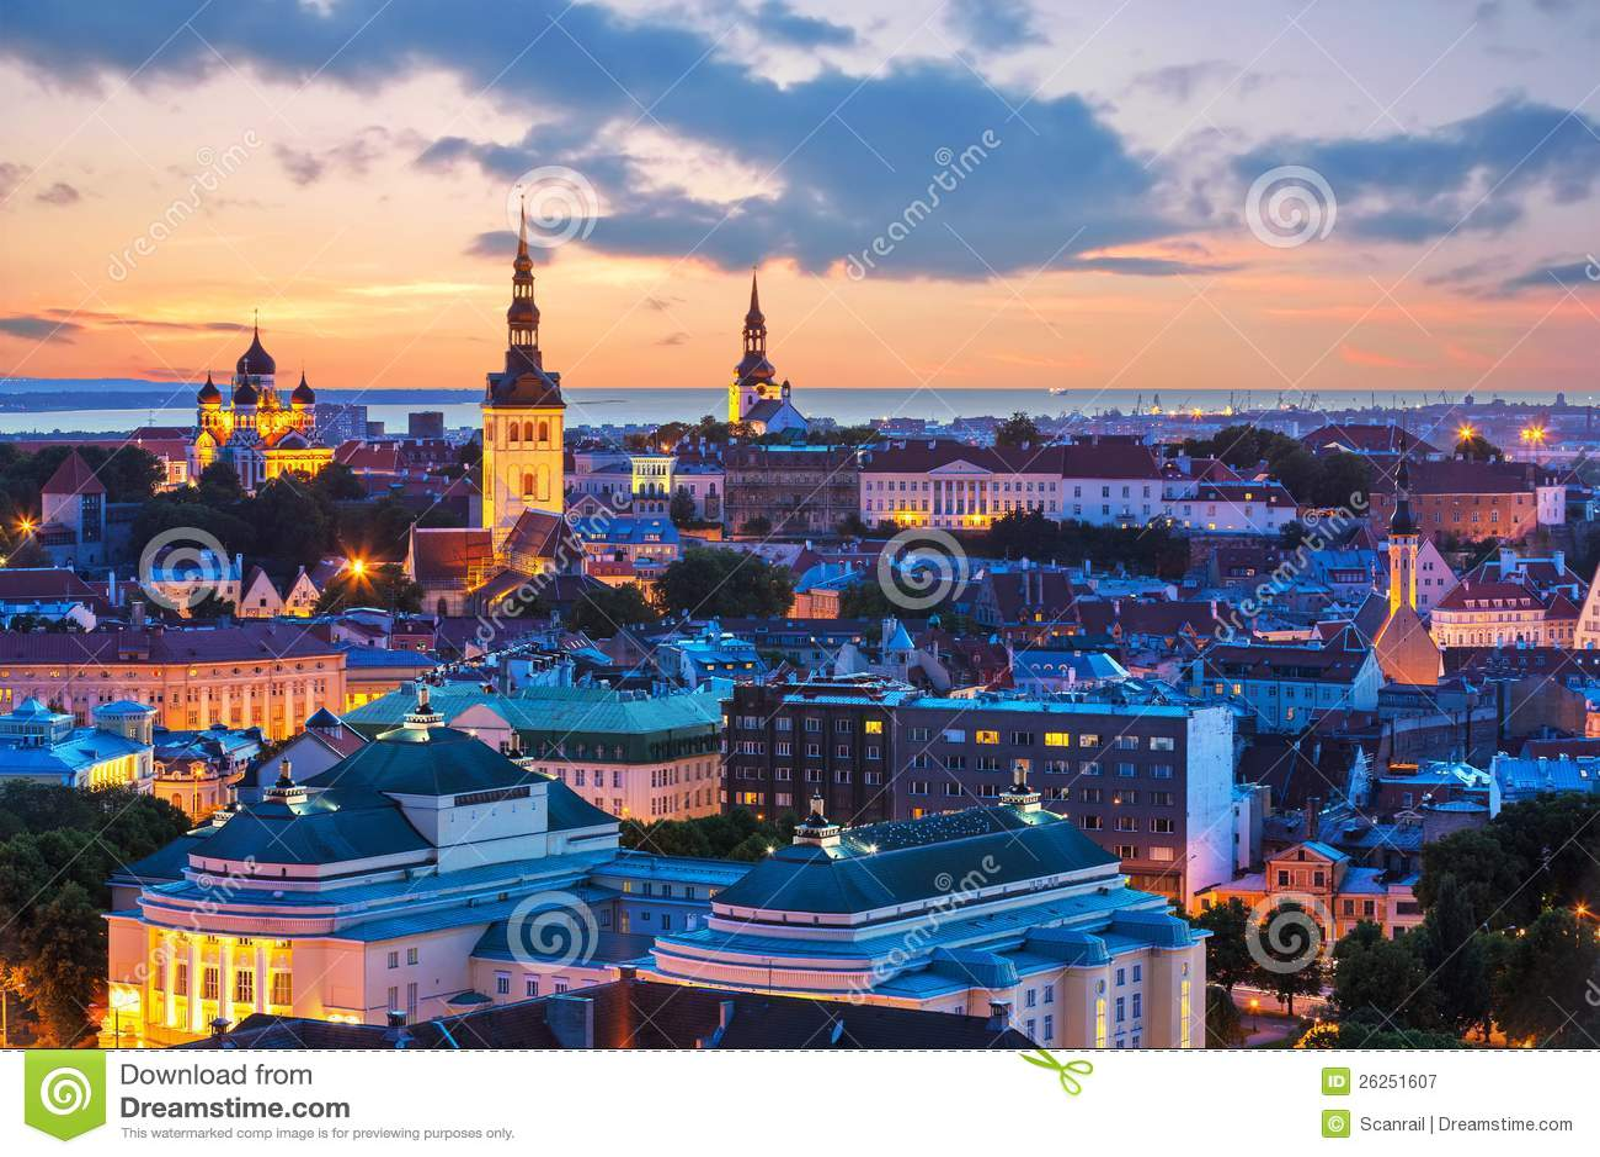 Evening Scenery Of Tallinn Estonia Royalty Free Stock